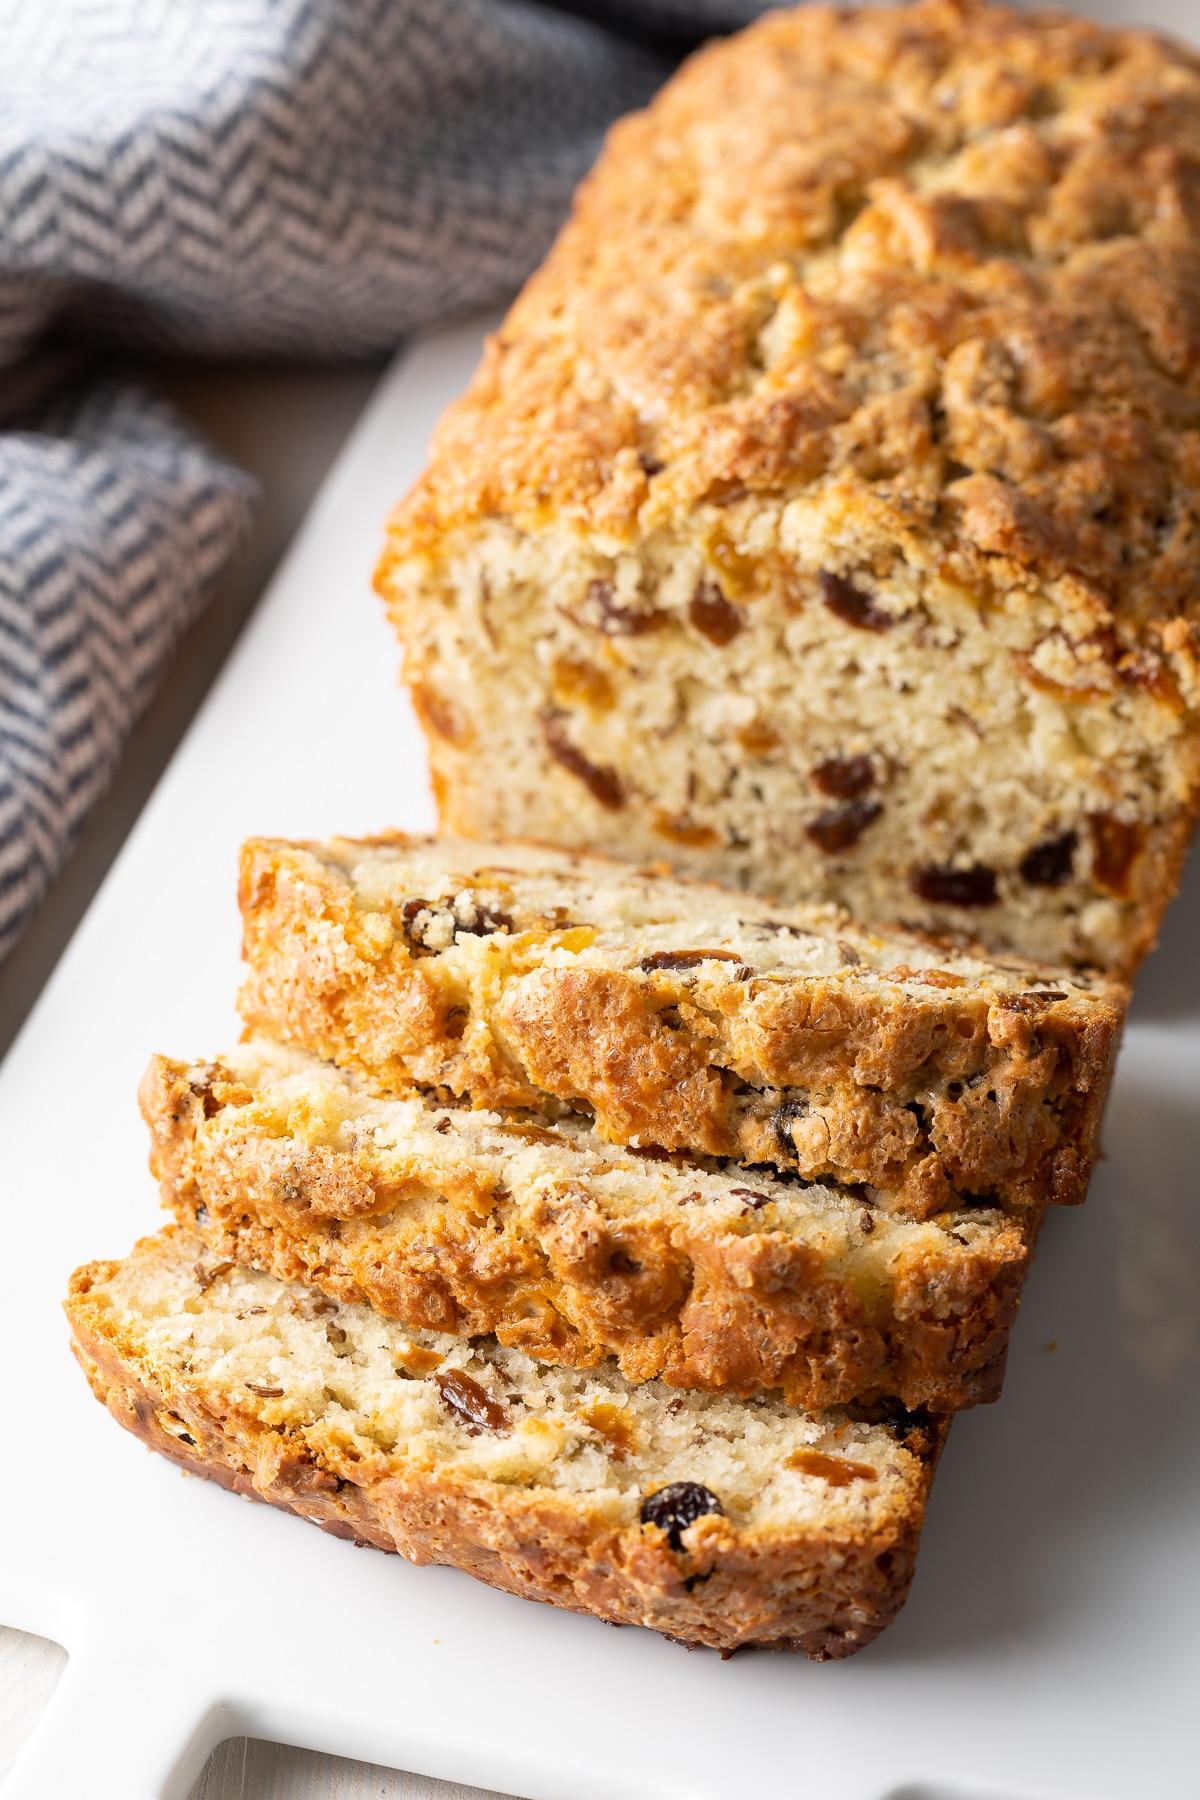 The Best Soda Bread Recipe  #ASpicyPerspective #march #saintpatricksday #stpatricksday #stpaddysday #bread #raisins #irish